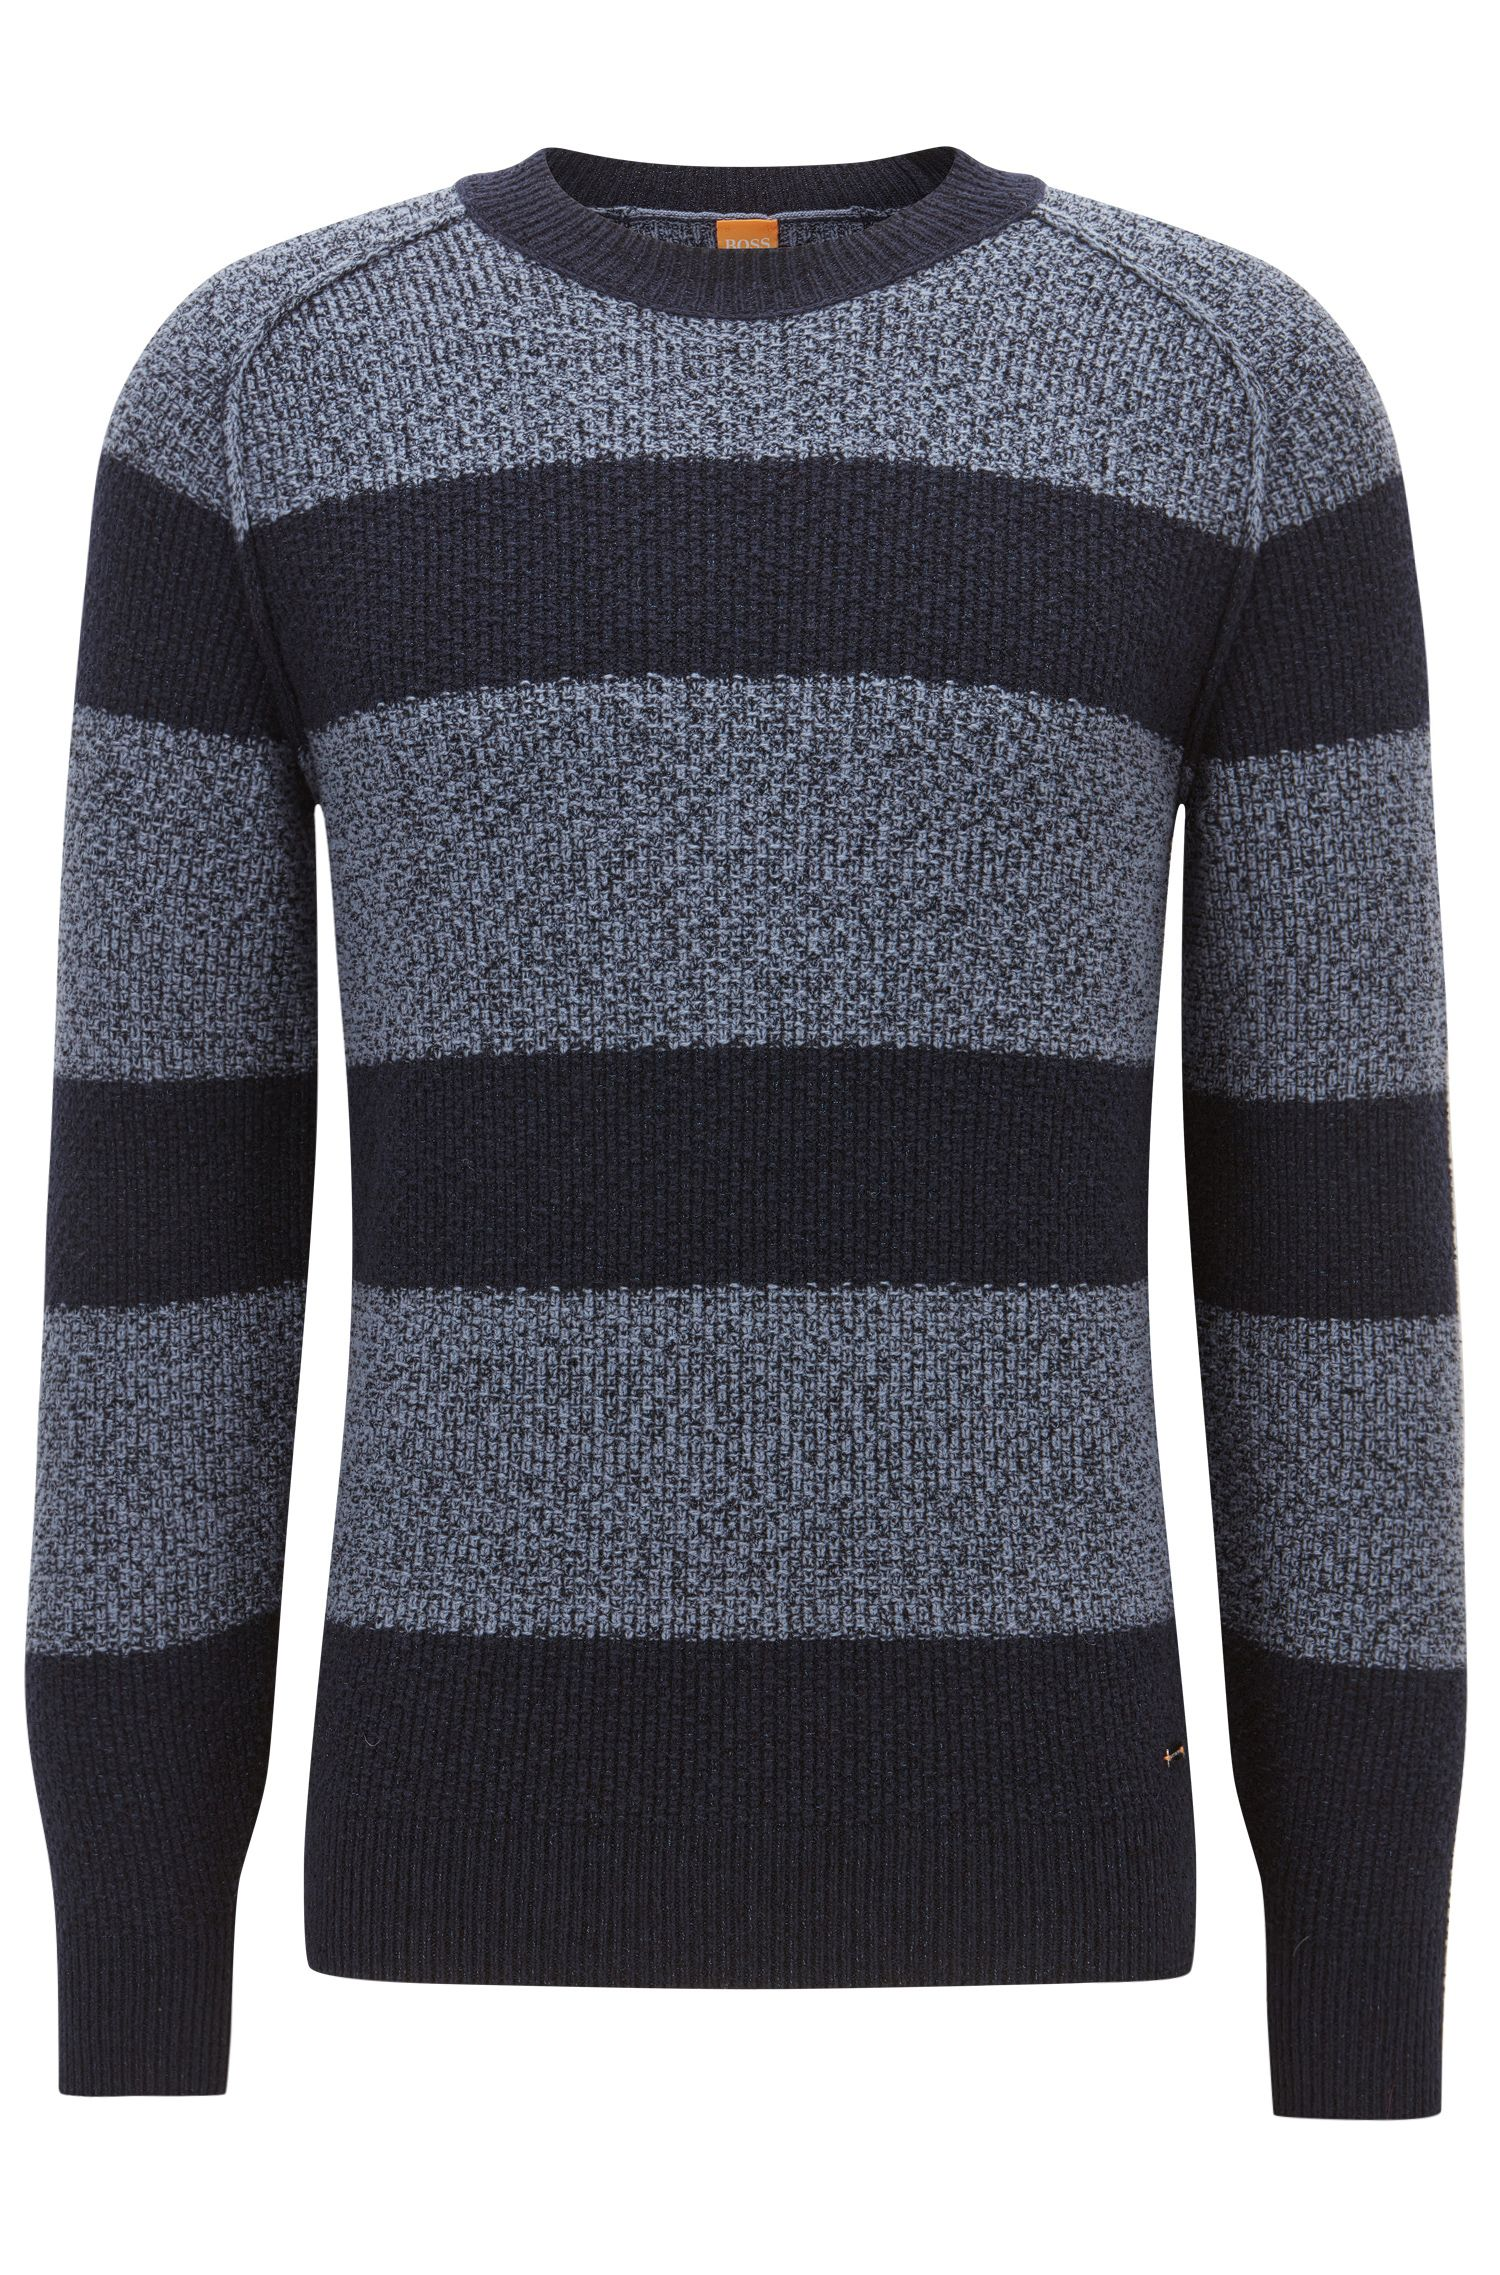 'Arbieri' | Striped Cotton-Wool Blend Sweater